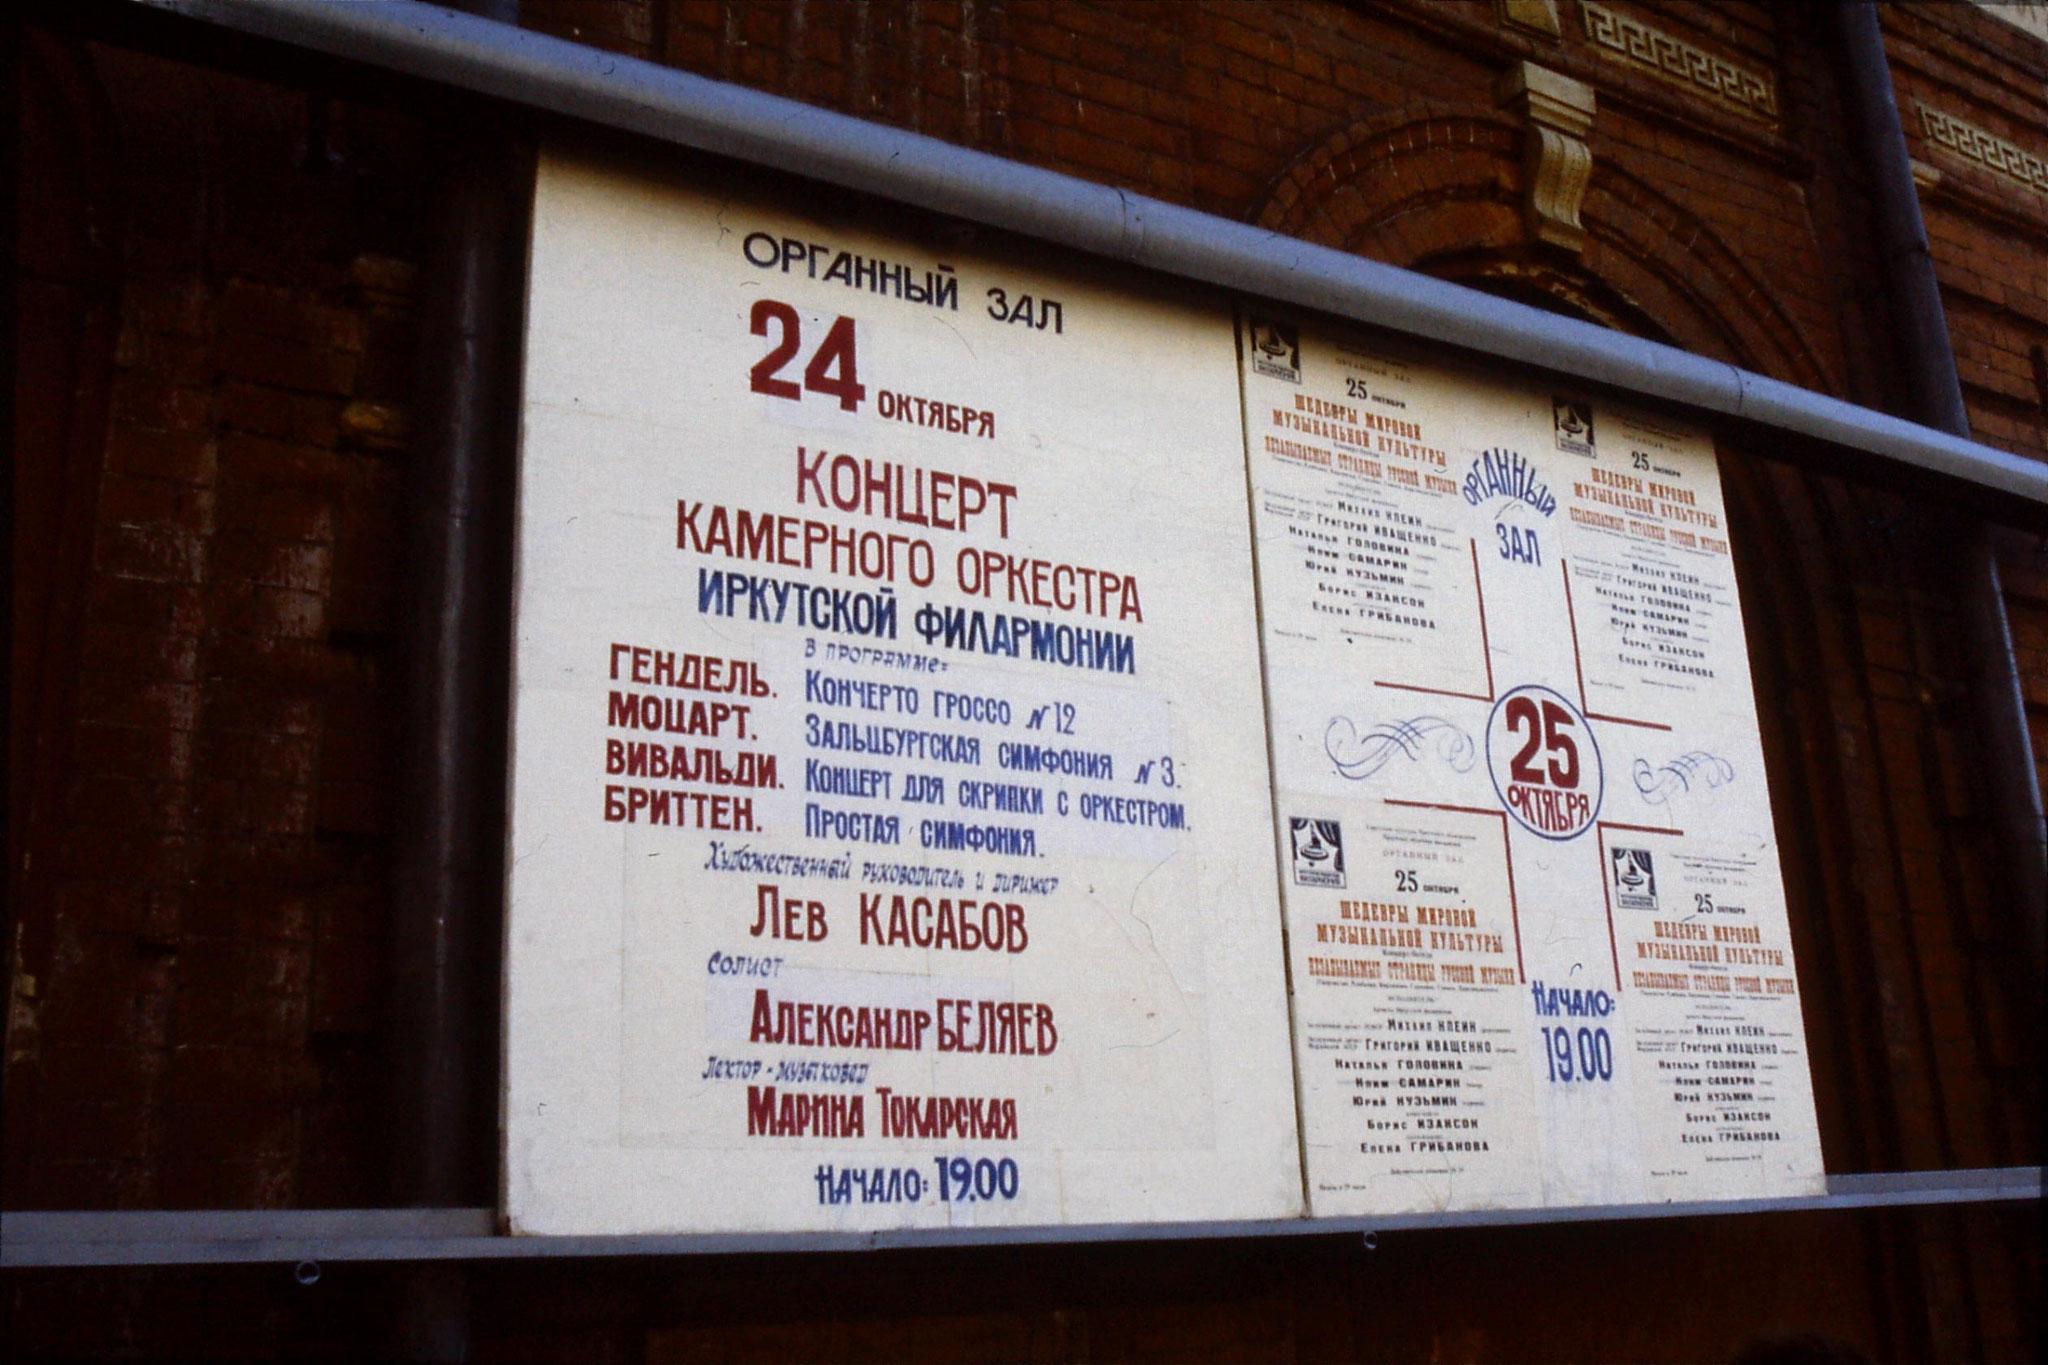 24/10/1988: 5: Irkutsk